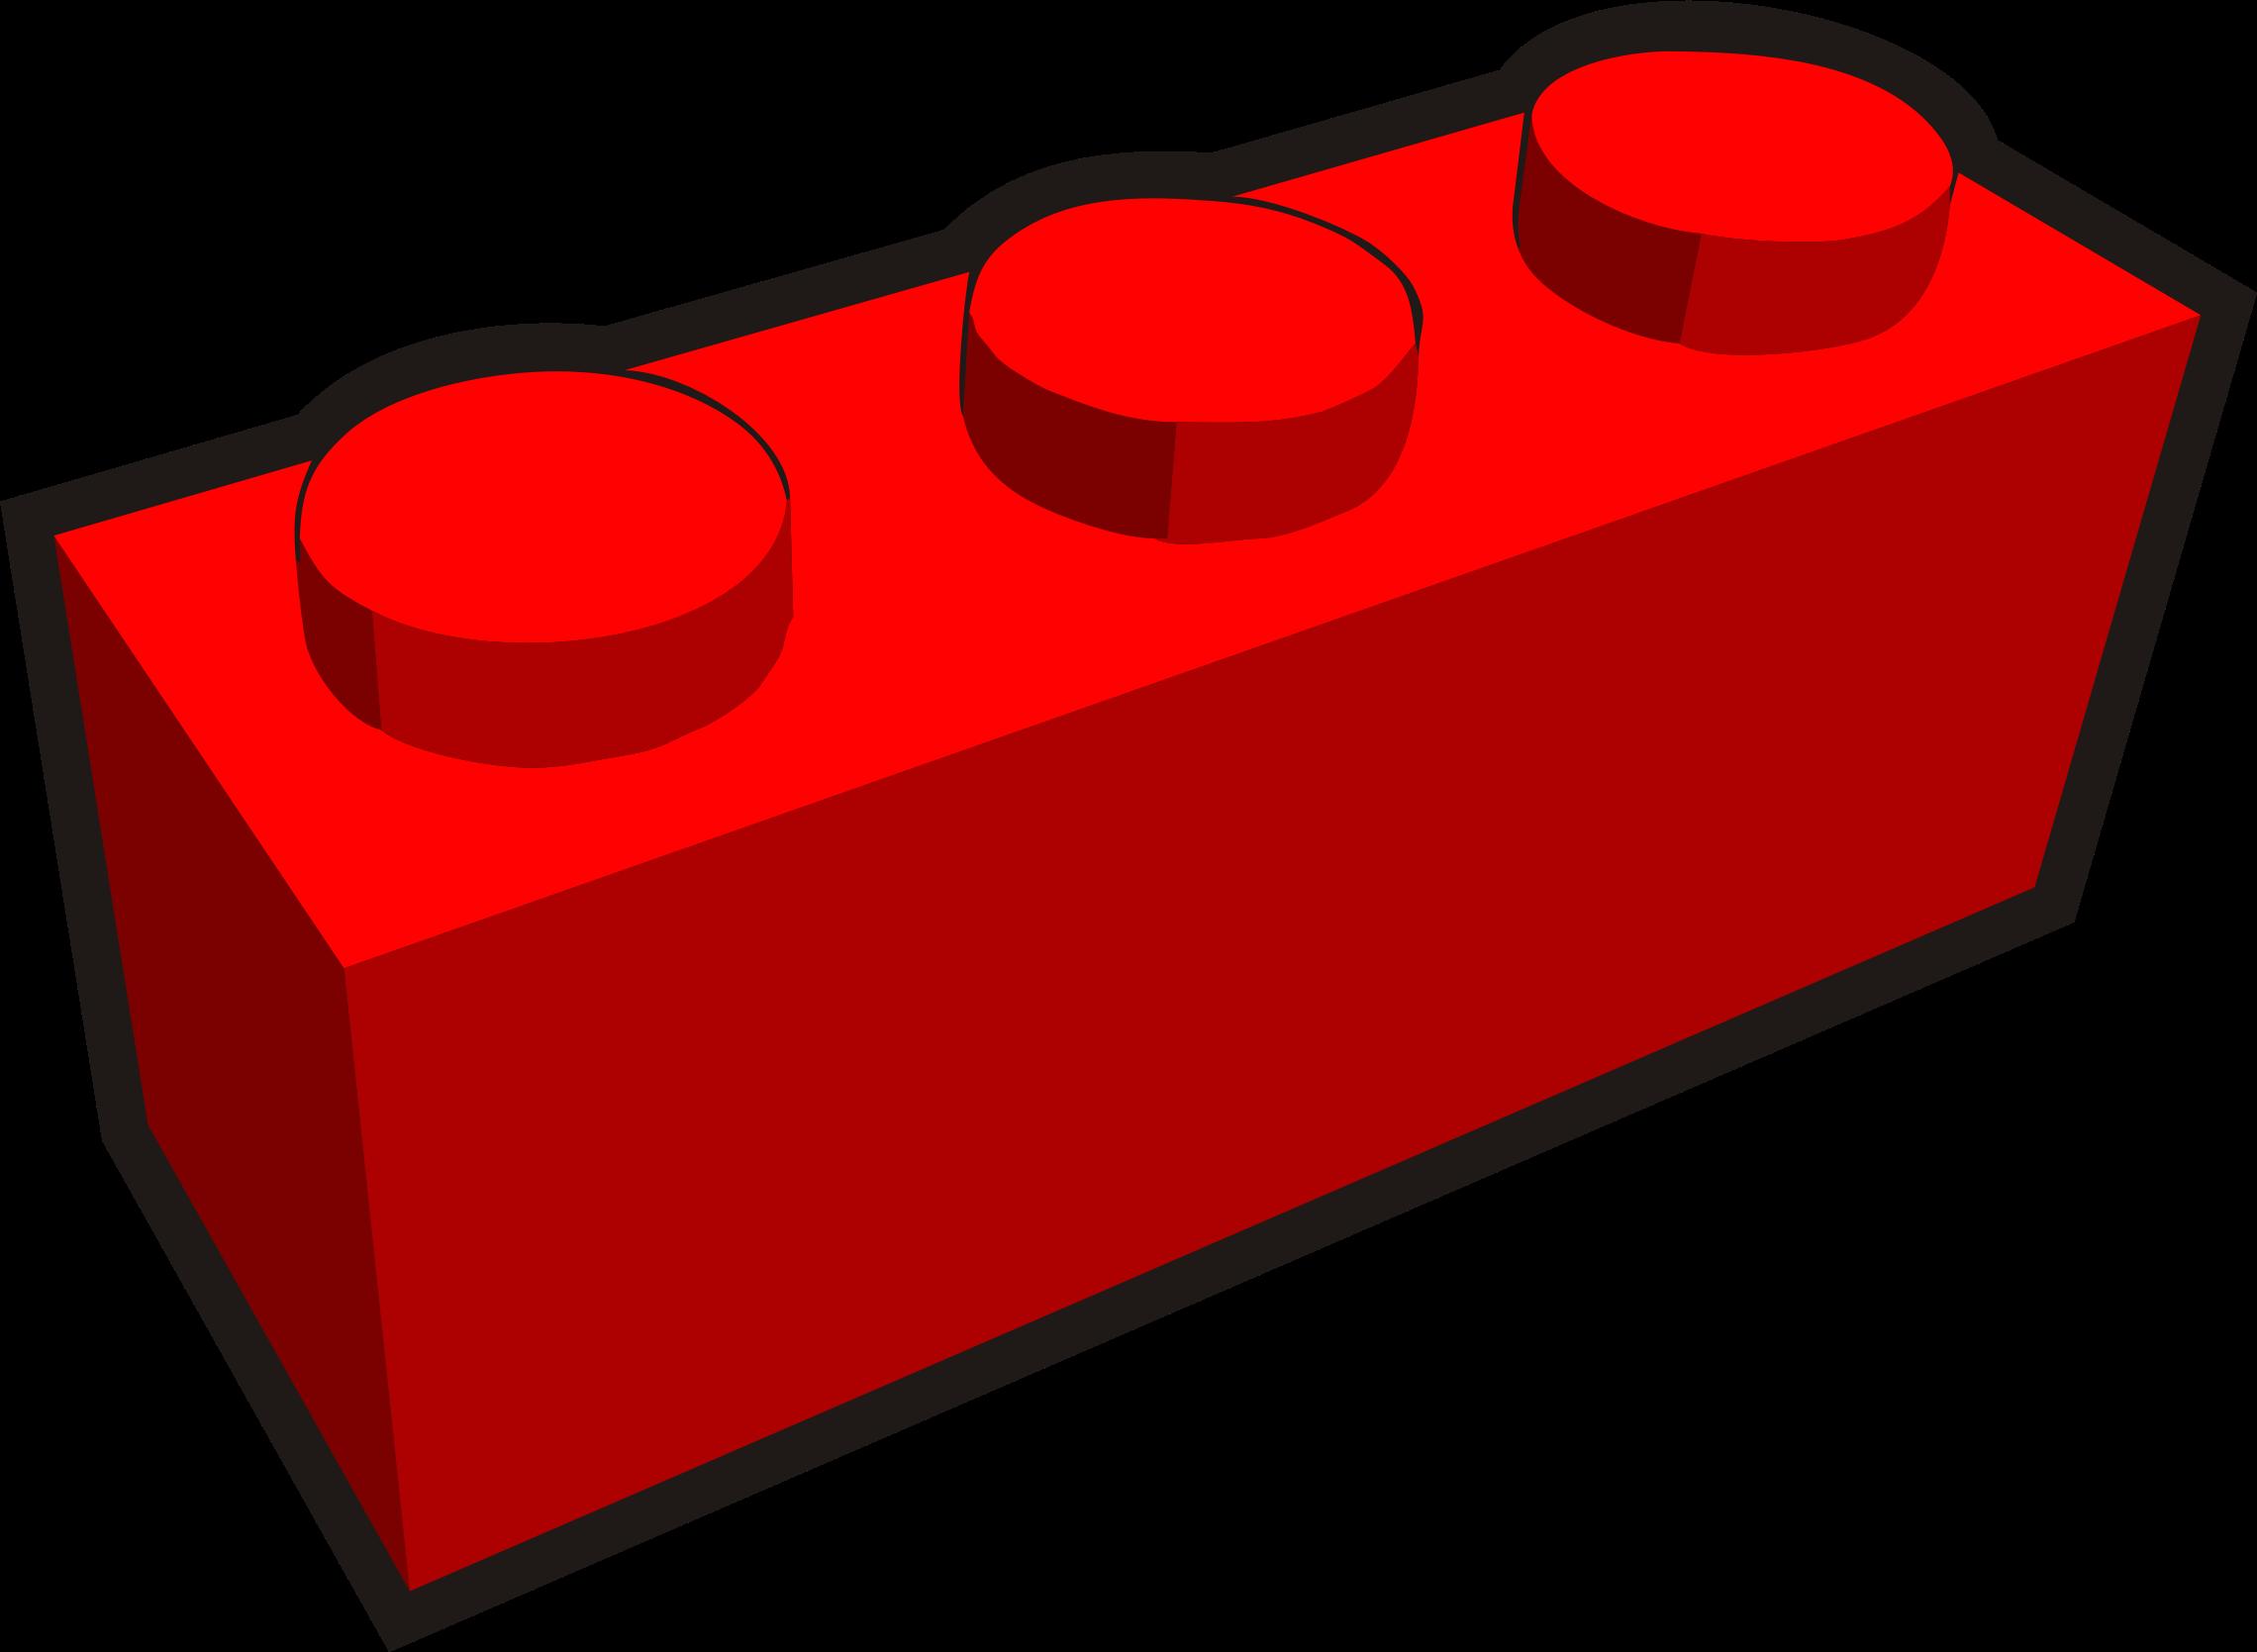 Legos clipart brick. Lego bricks free download